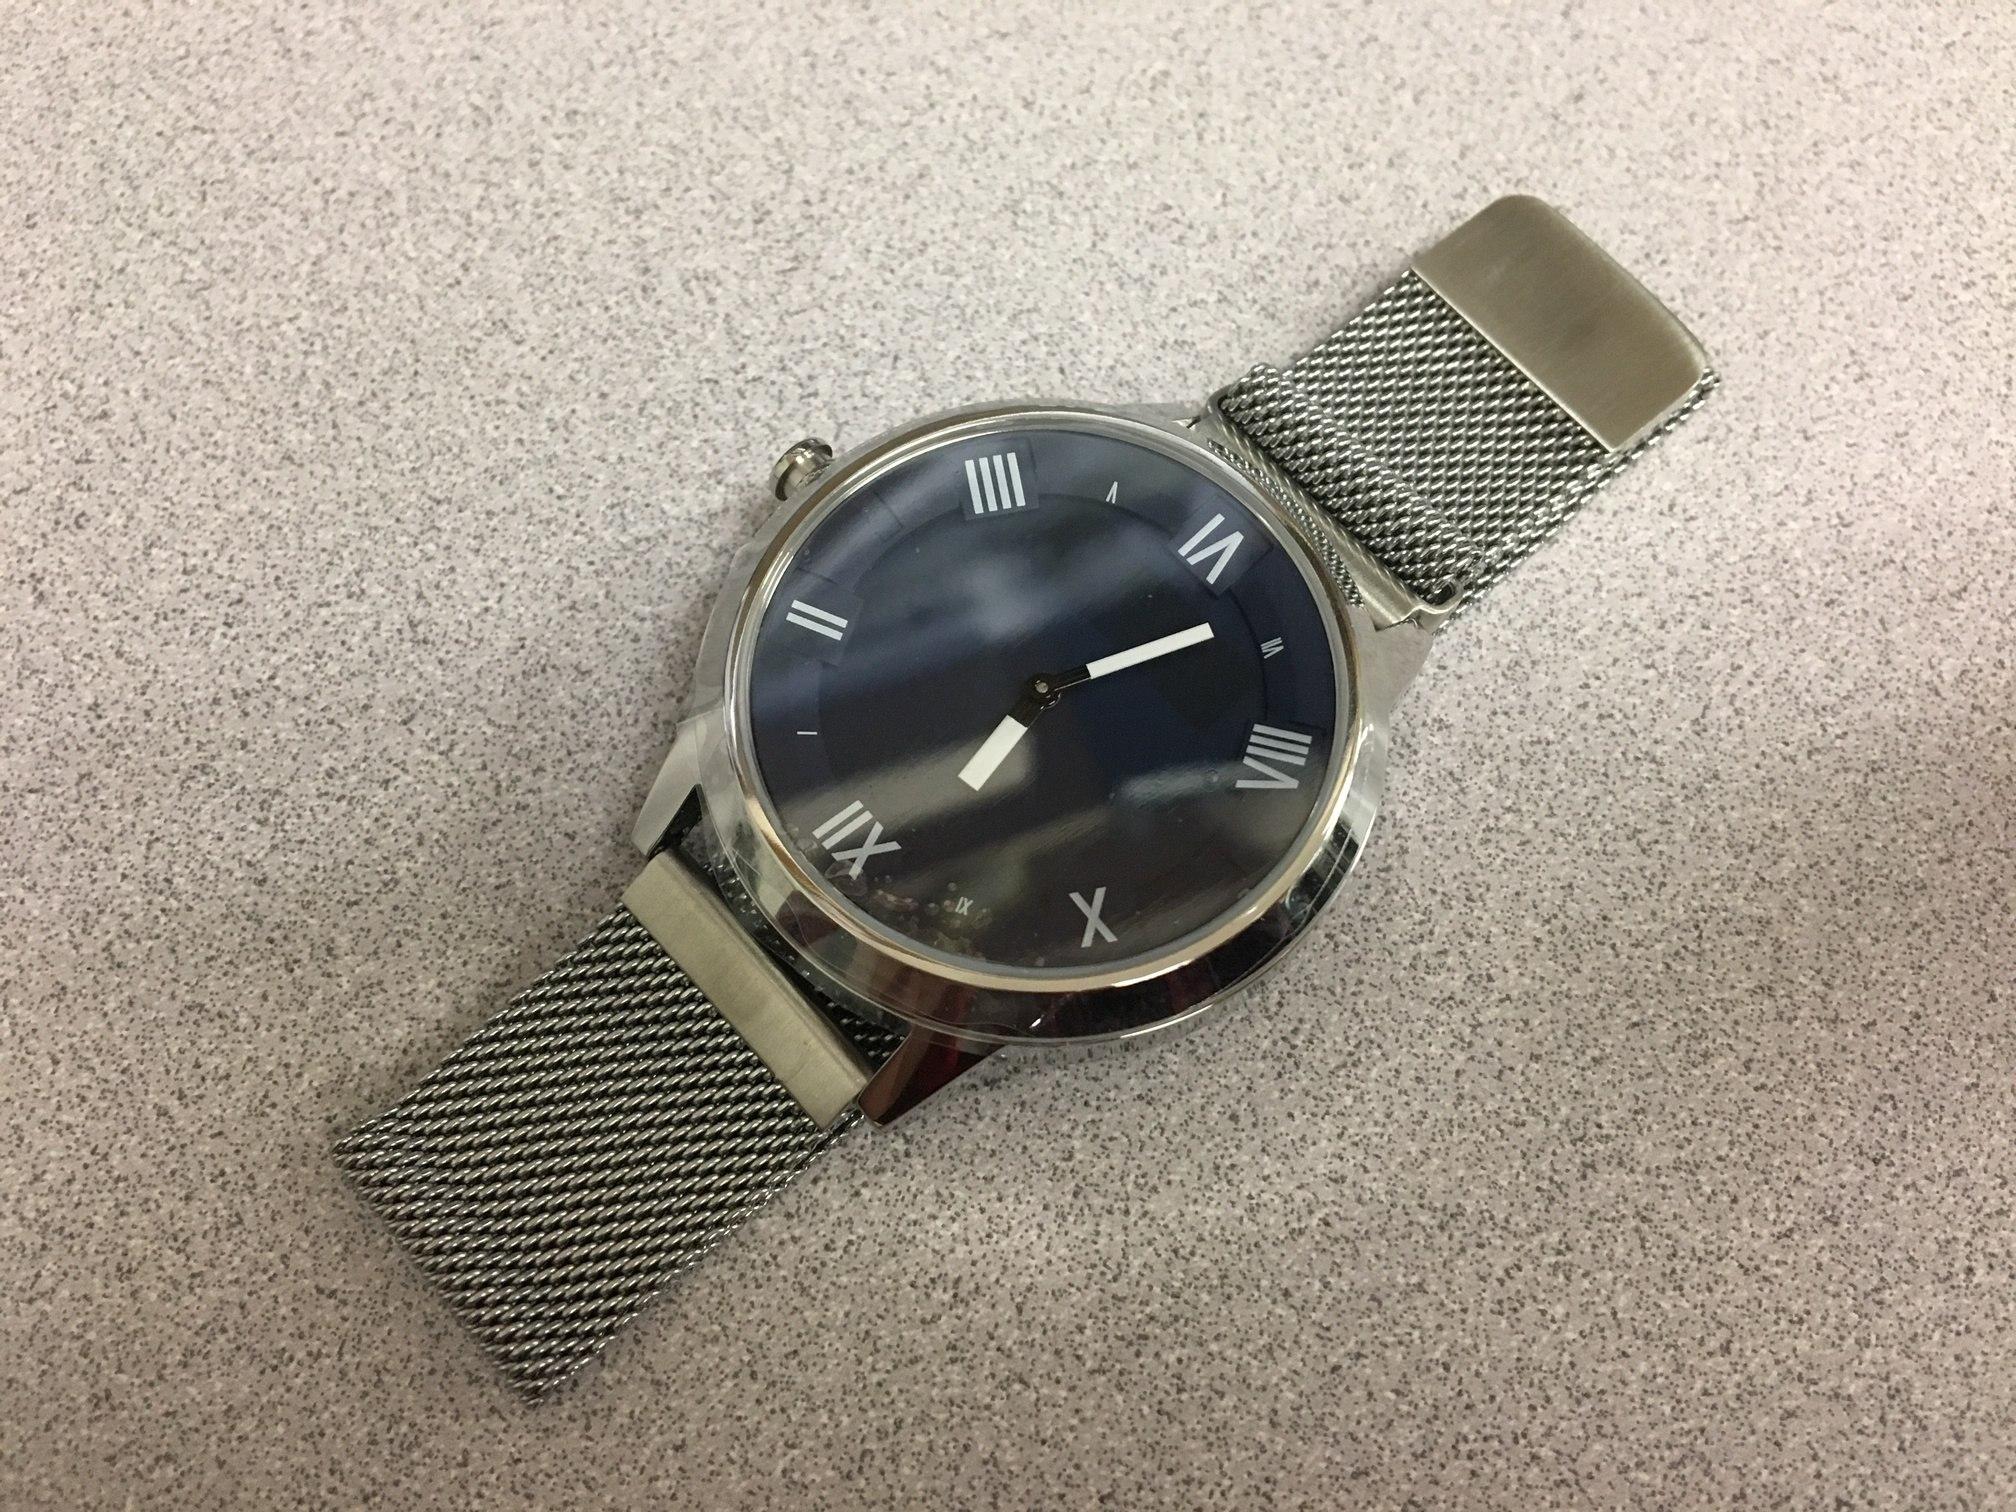 Lenovo Watch X Plus (Smart Watch) & English Manual | an Ephemeral